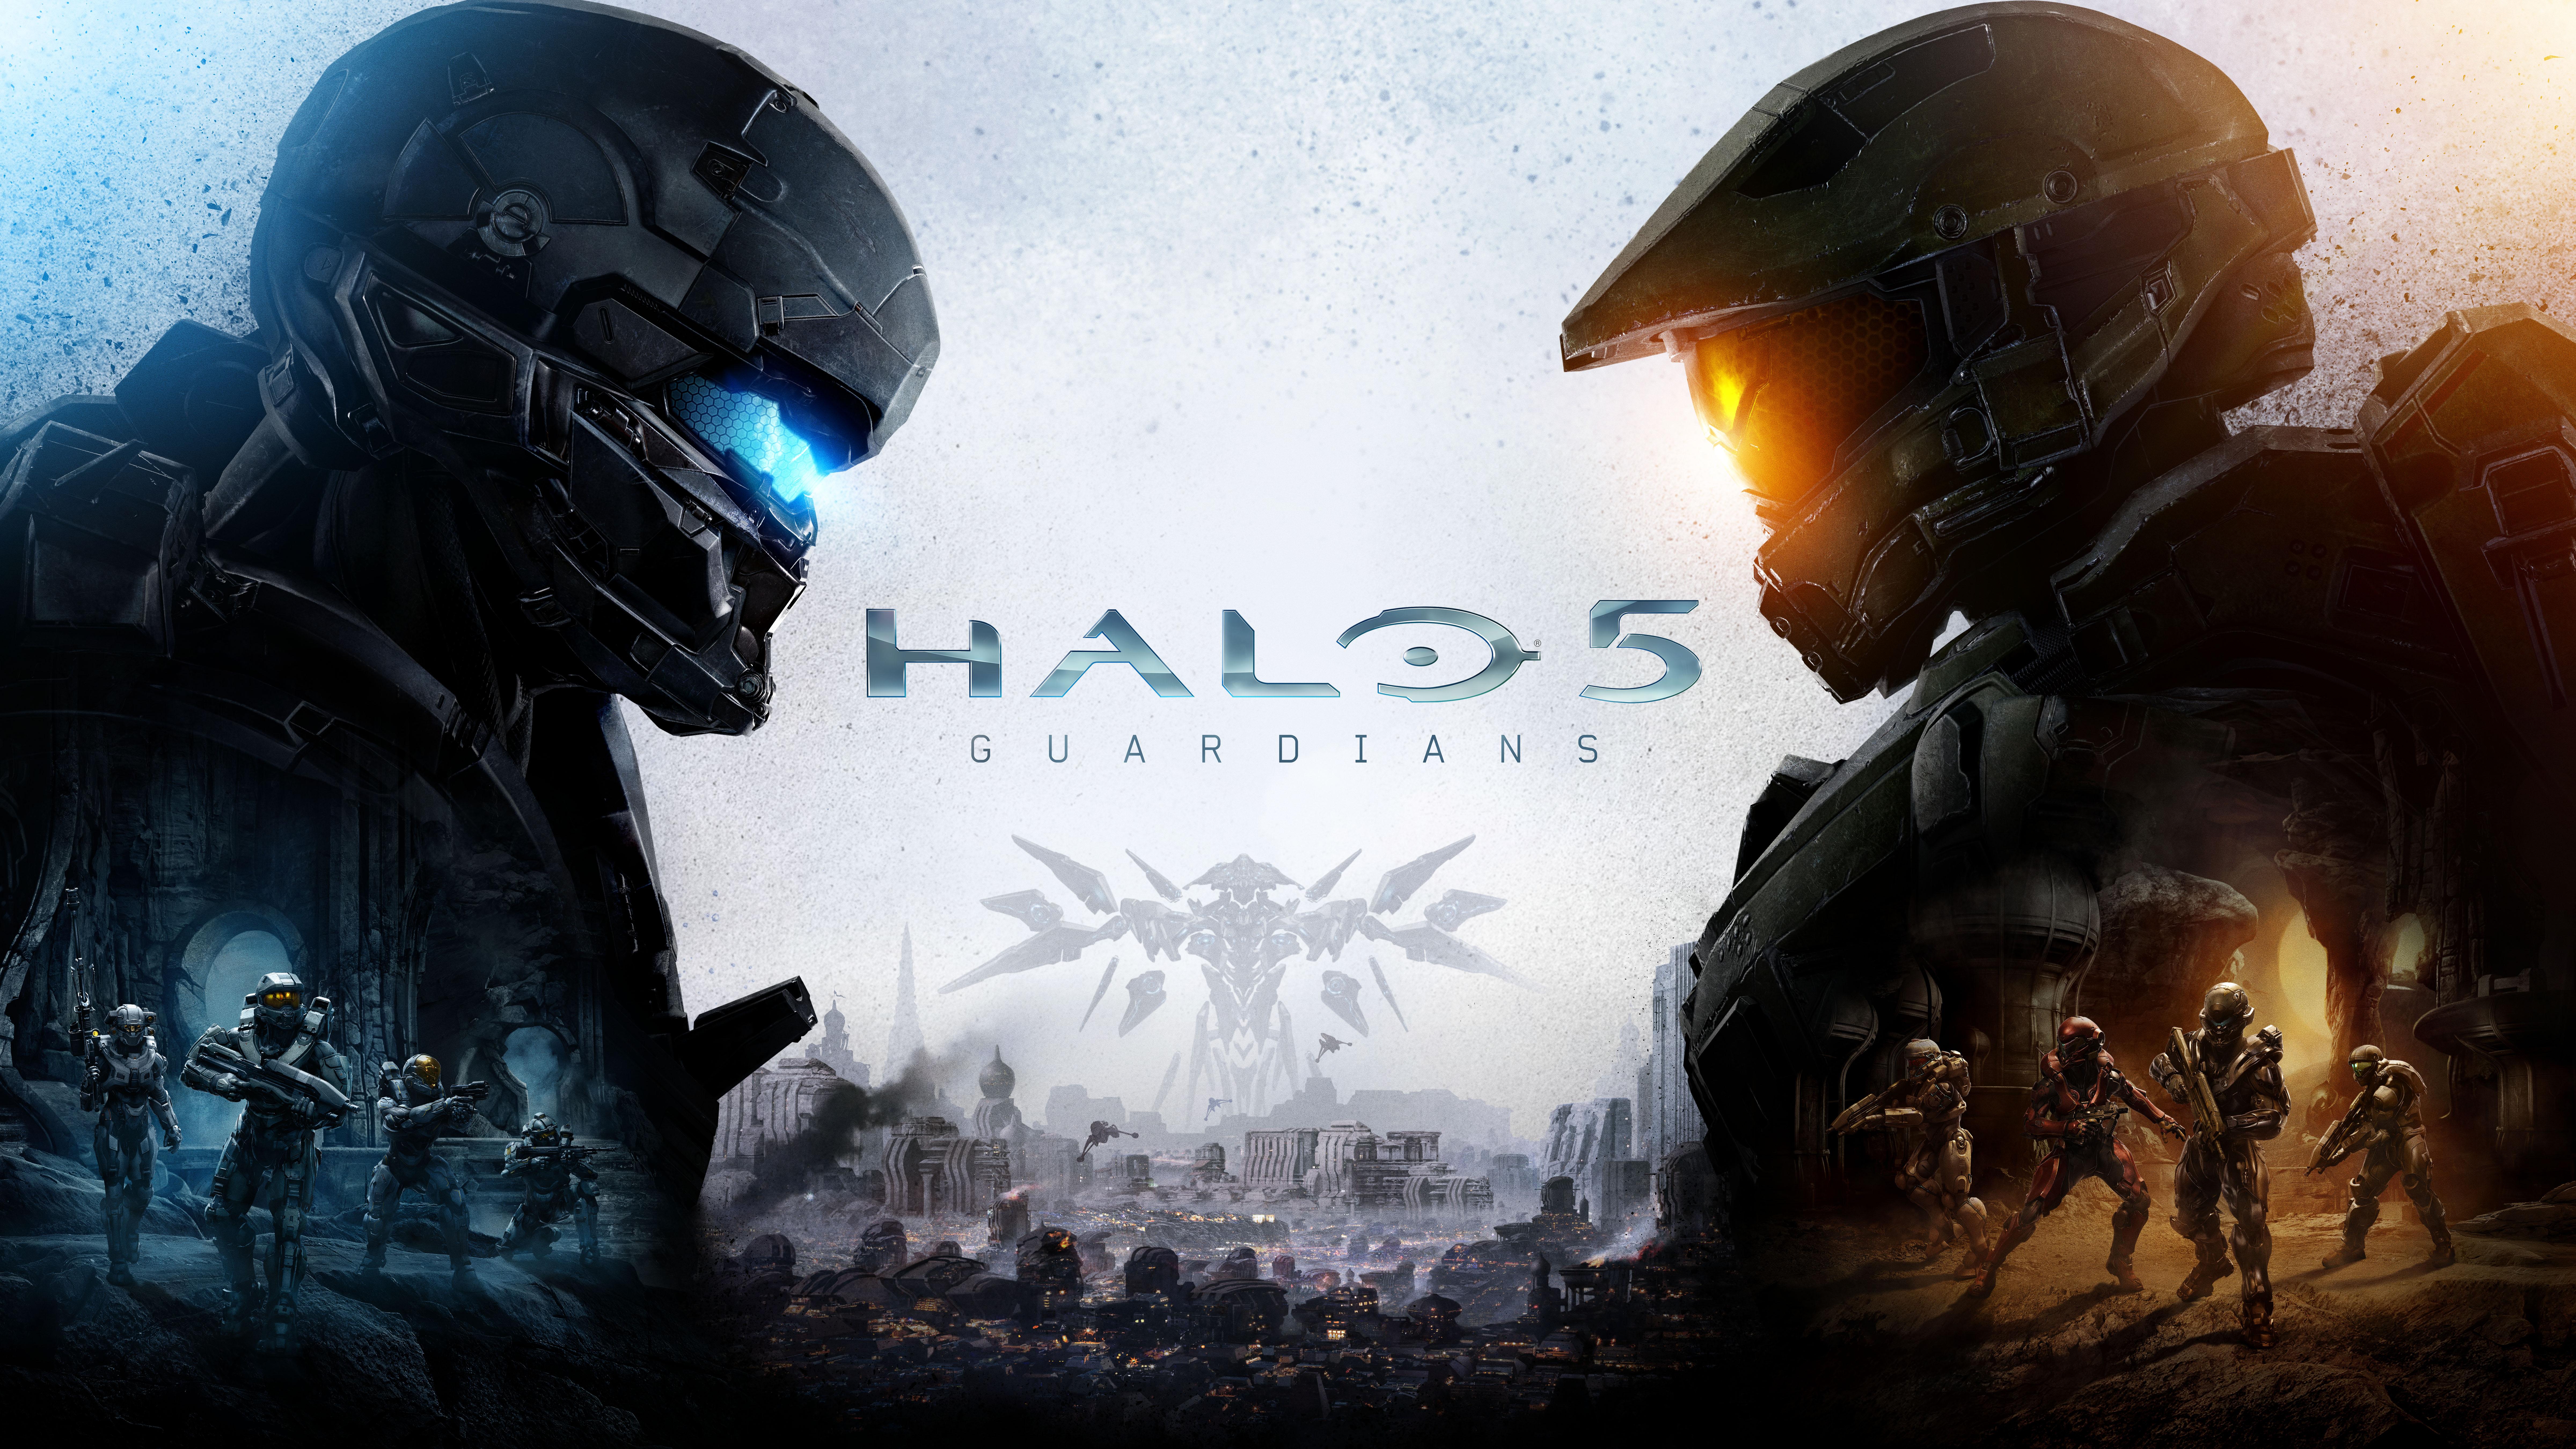 Halo 5 Guardians Halo Master Chief 9600x5400